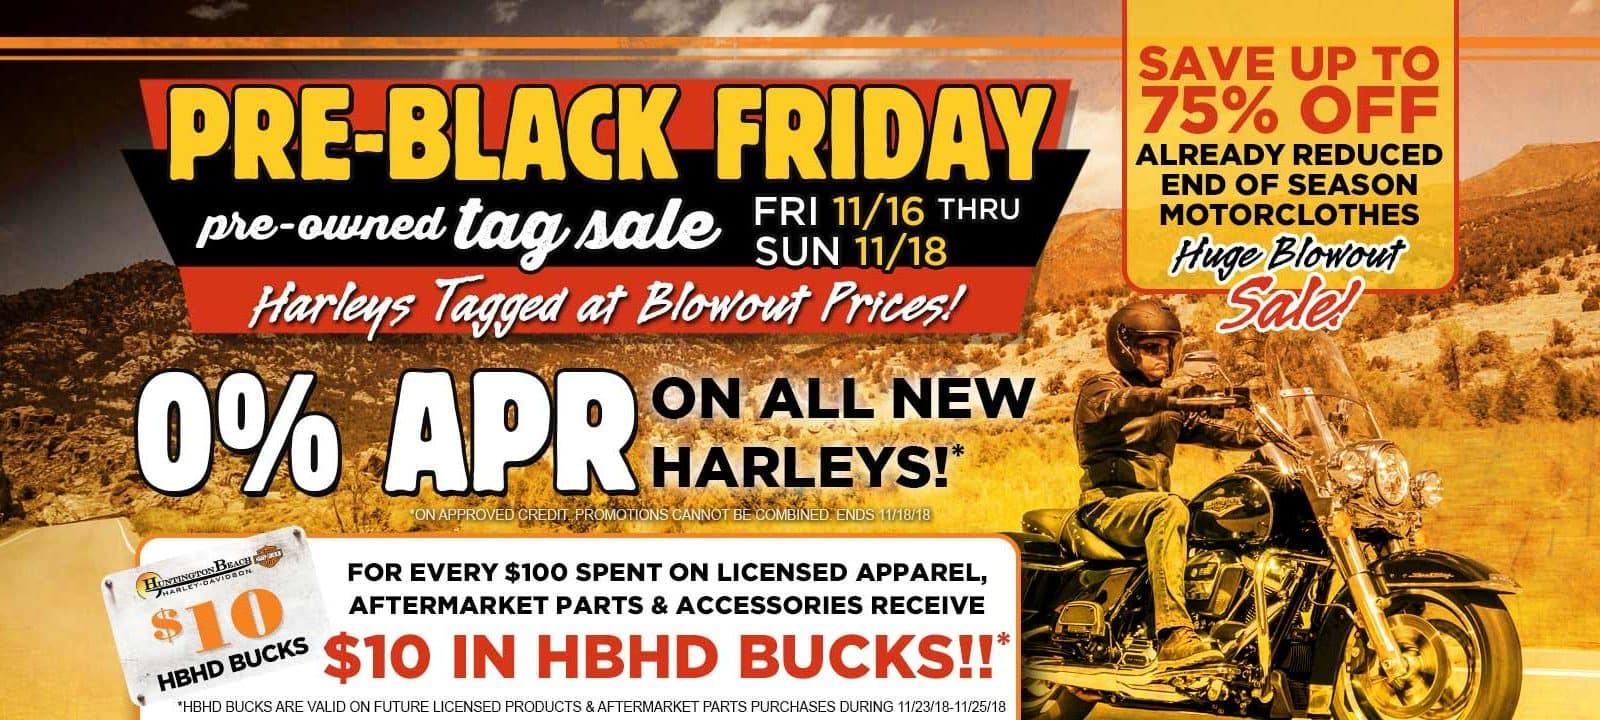 20181112-HBHD-1800x720-Pre-Black-Friday-Sale-0-APR